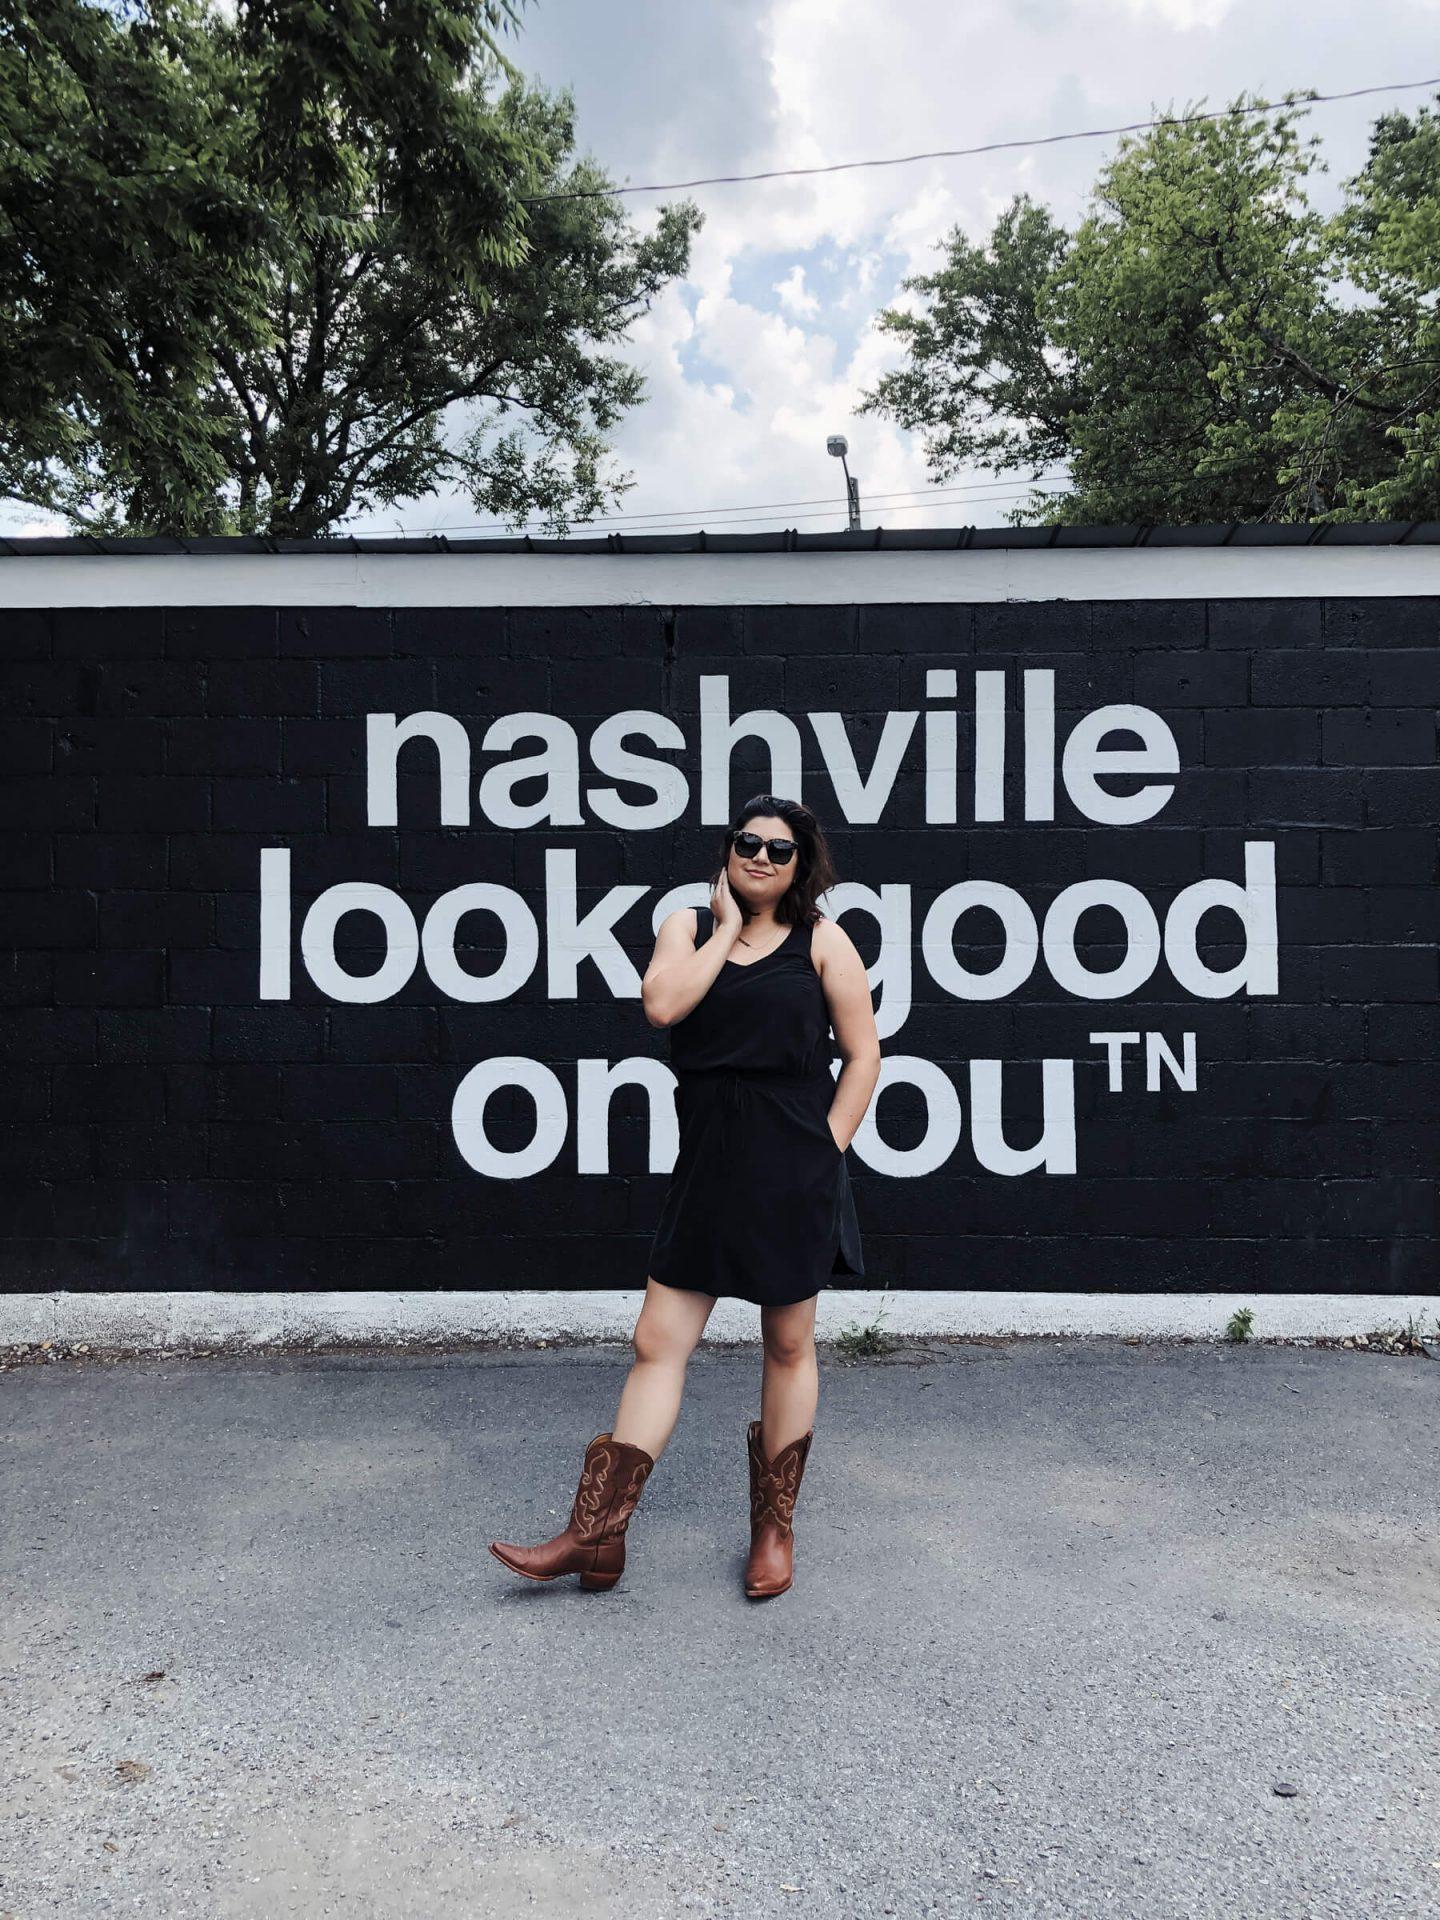 Sababok Nashville Nashlooksgoodonyou 1440x1920